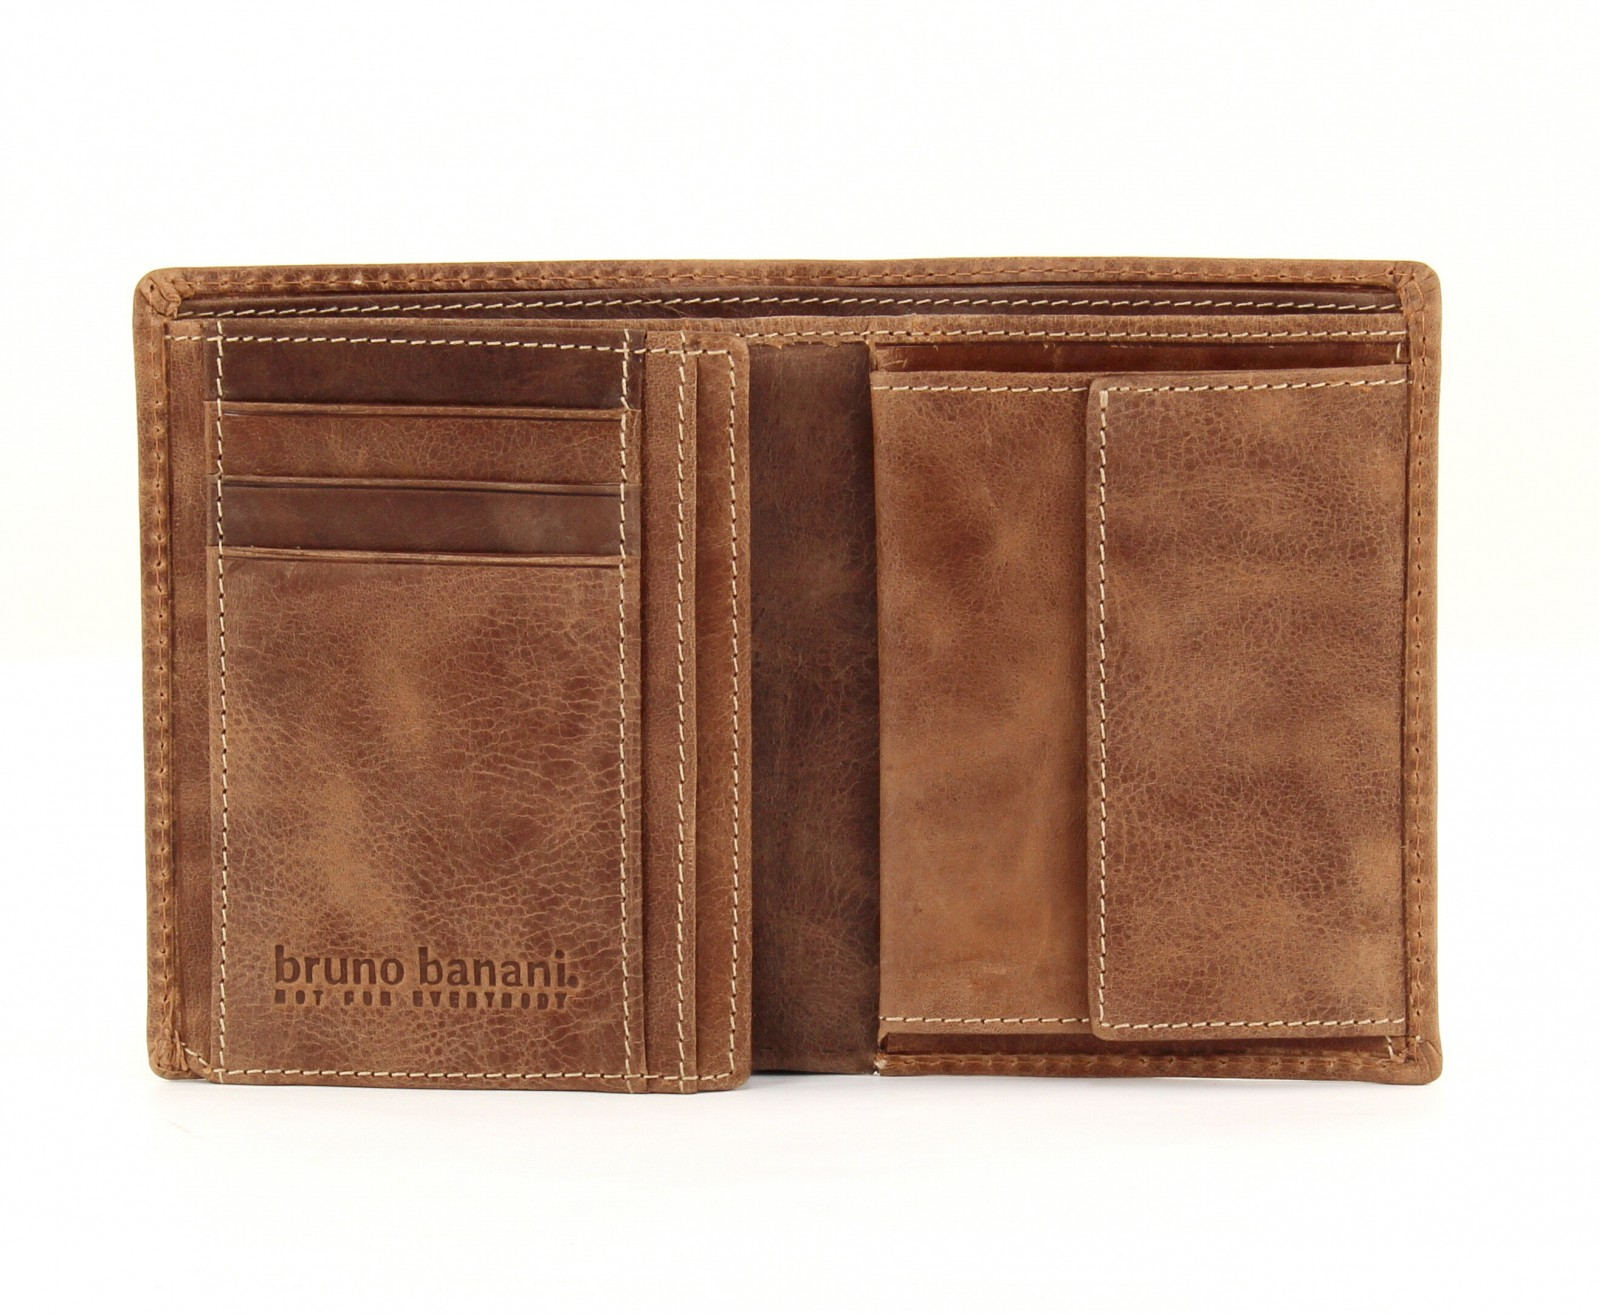 bruno banani Vista Classic Wallet High Cognac / Brown